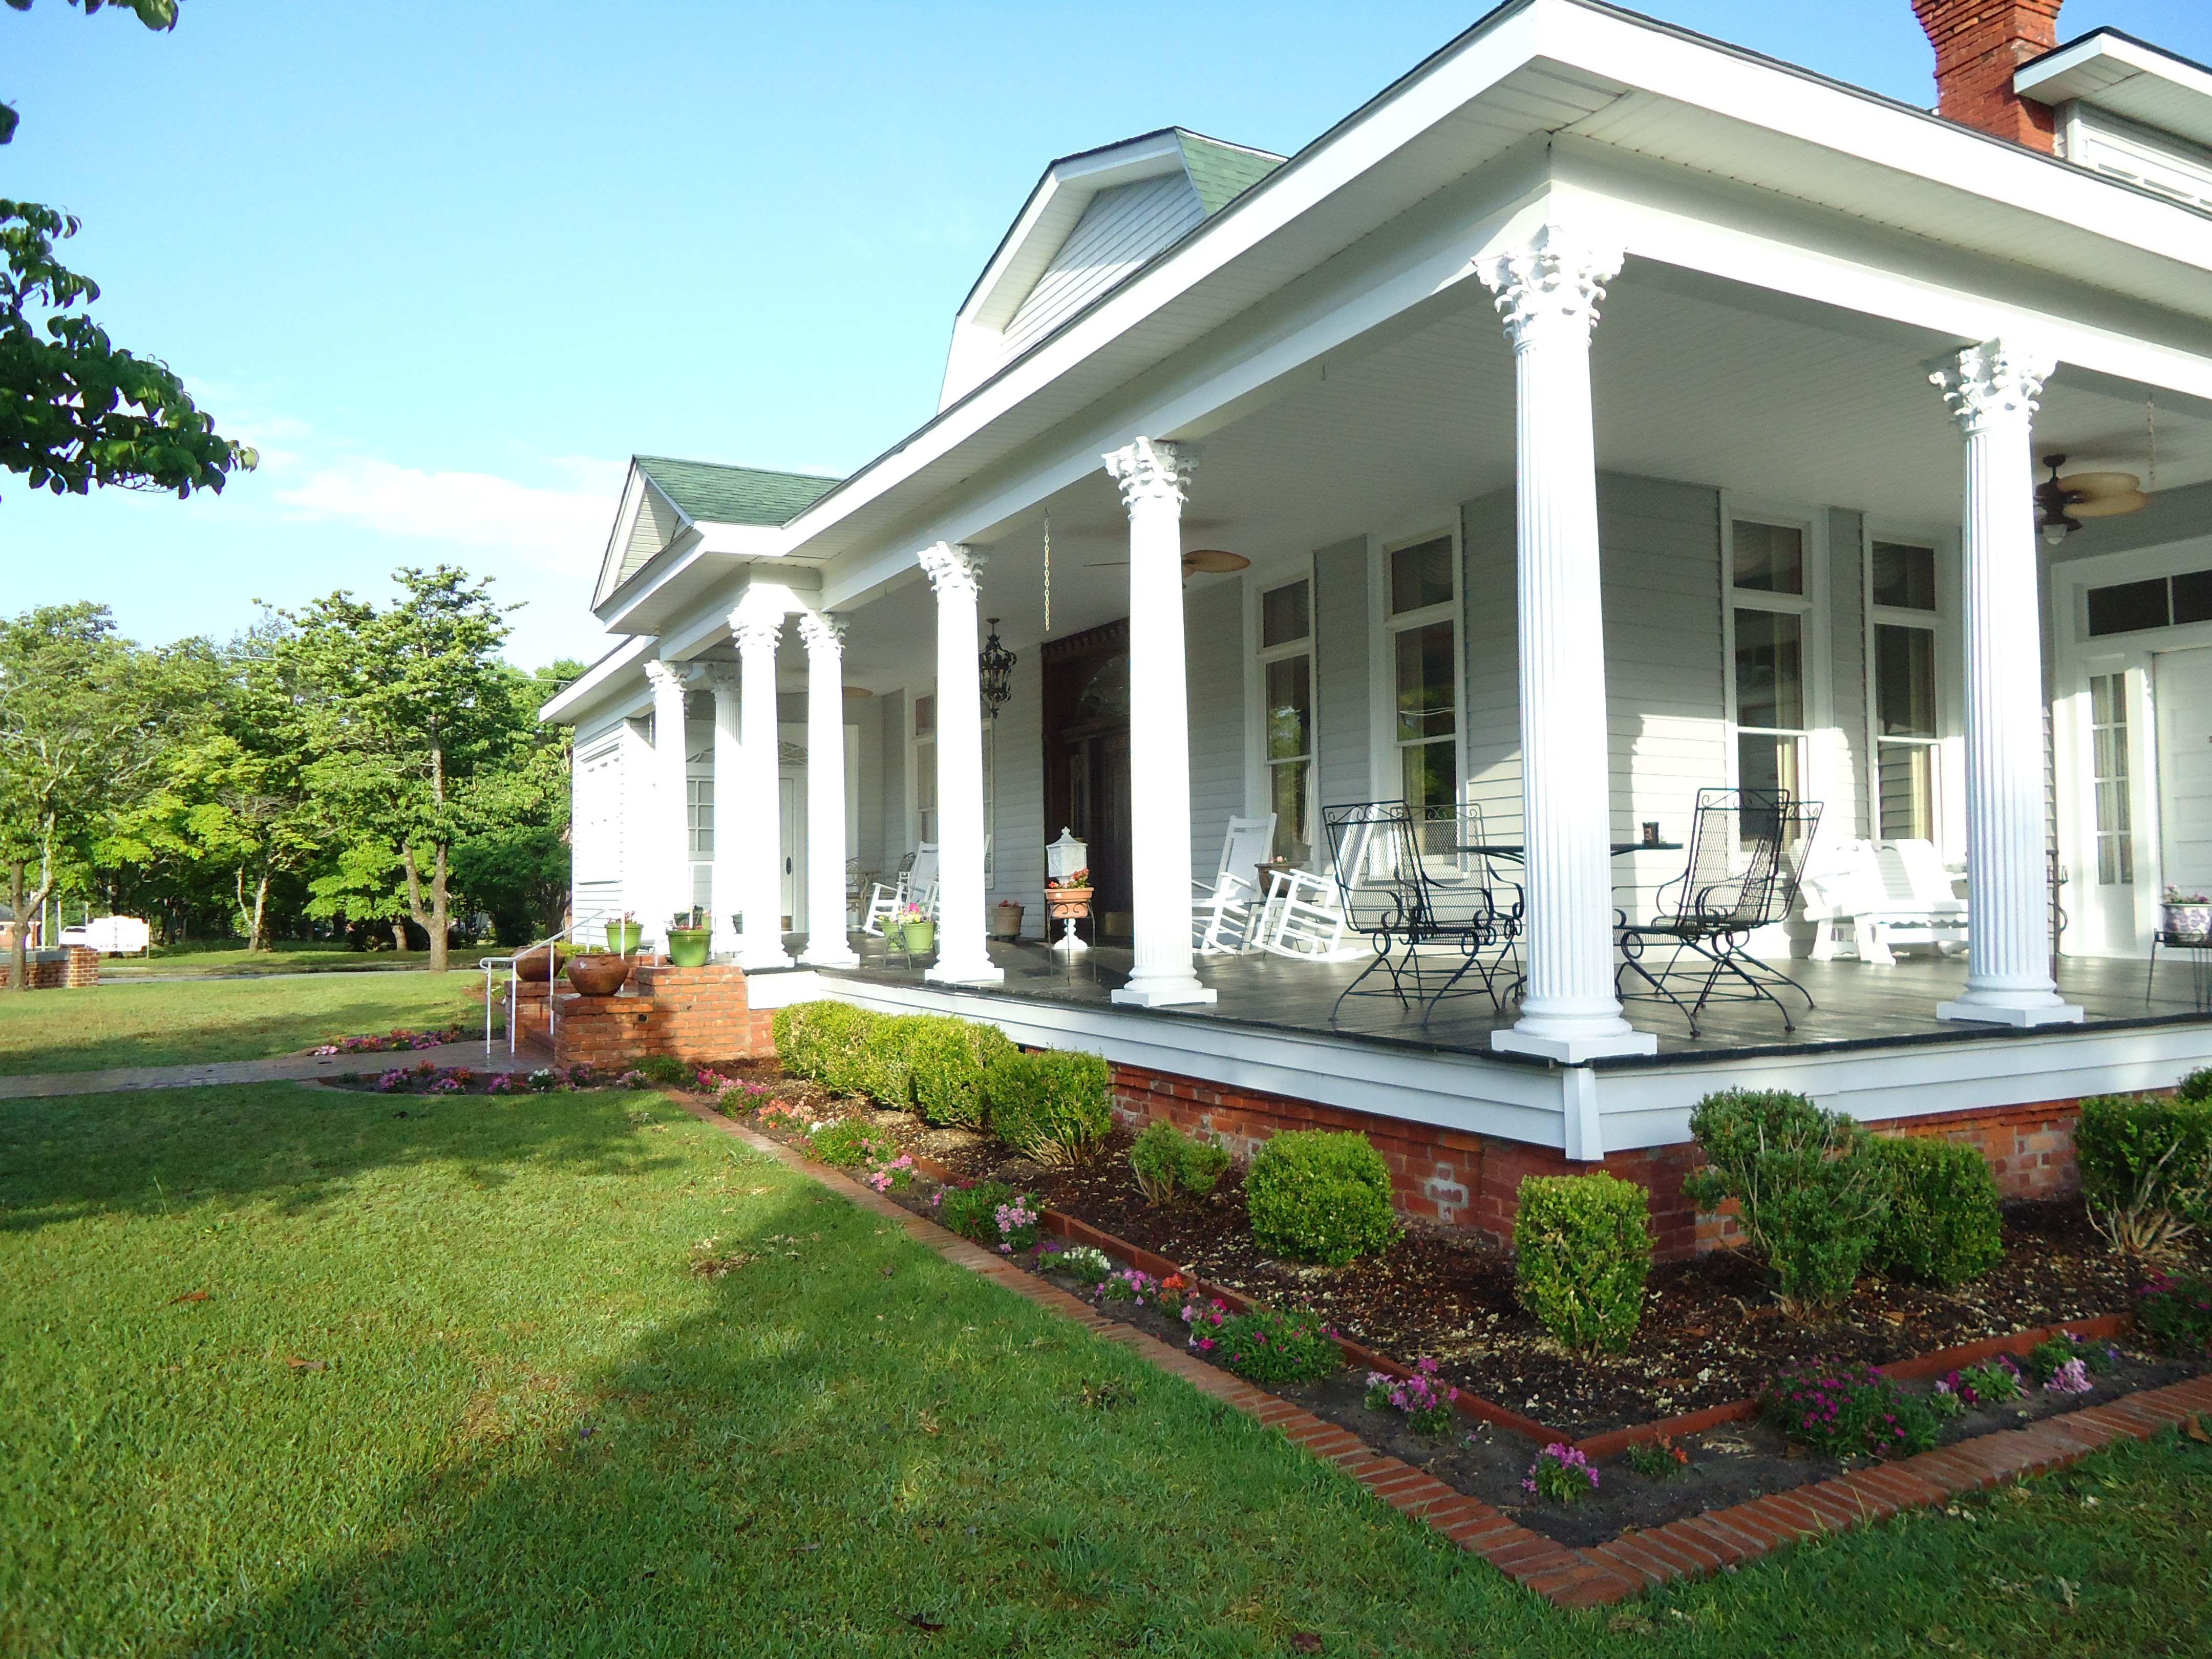 Southeast Inn For Sale Swainsboro,